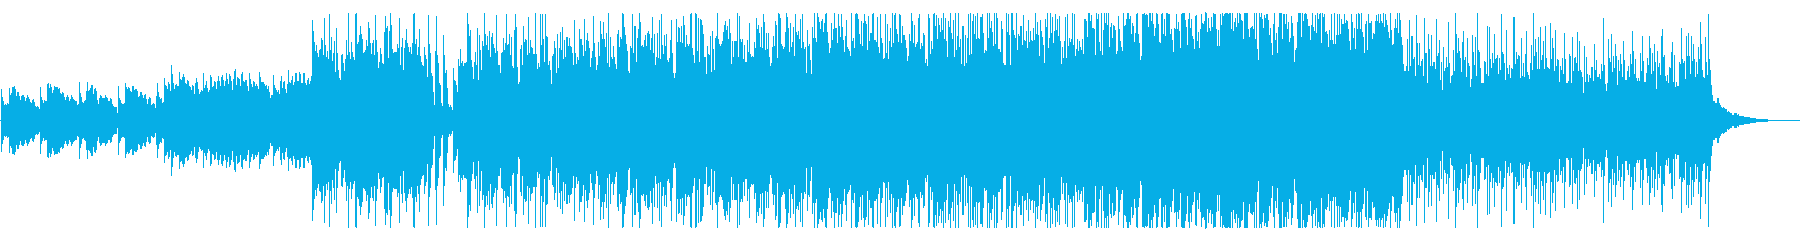 KANTハーモニクスキラキラBGMの再生済みの波形